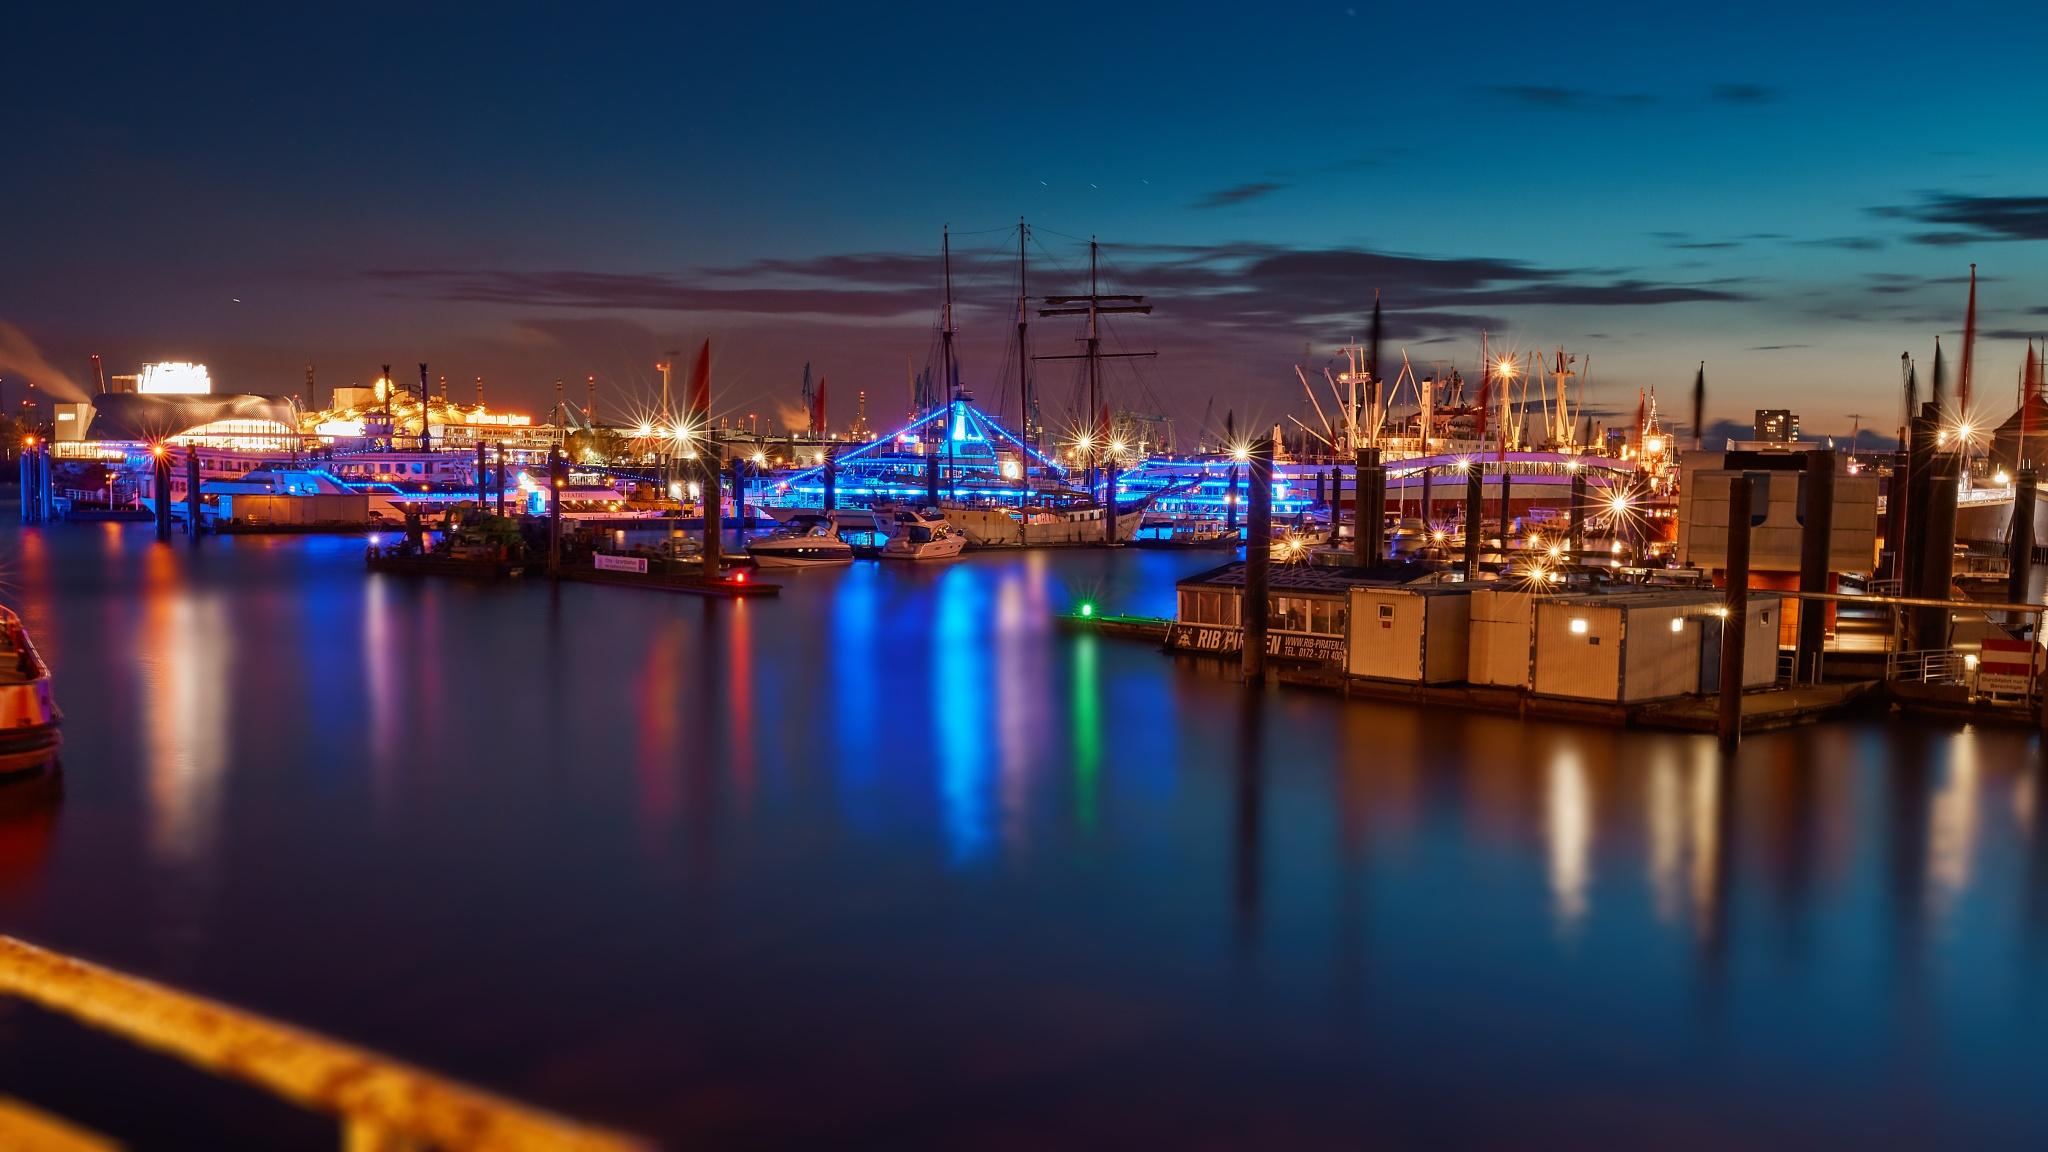 Photo in Cityscape #harbor #port #haven #marina #seaport #docks #water #sea #hamburg #ship #ships #night #nightshot #exposure #light #lights #reflection #dark #city #cityscape #landscape #sky #shine #shining